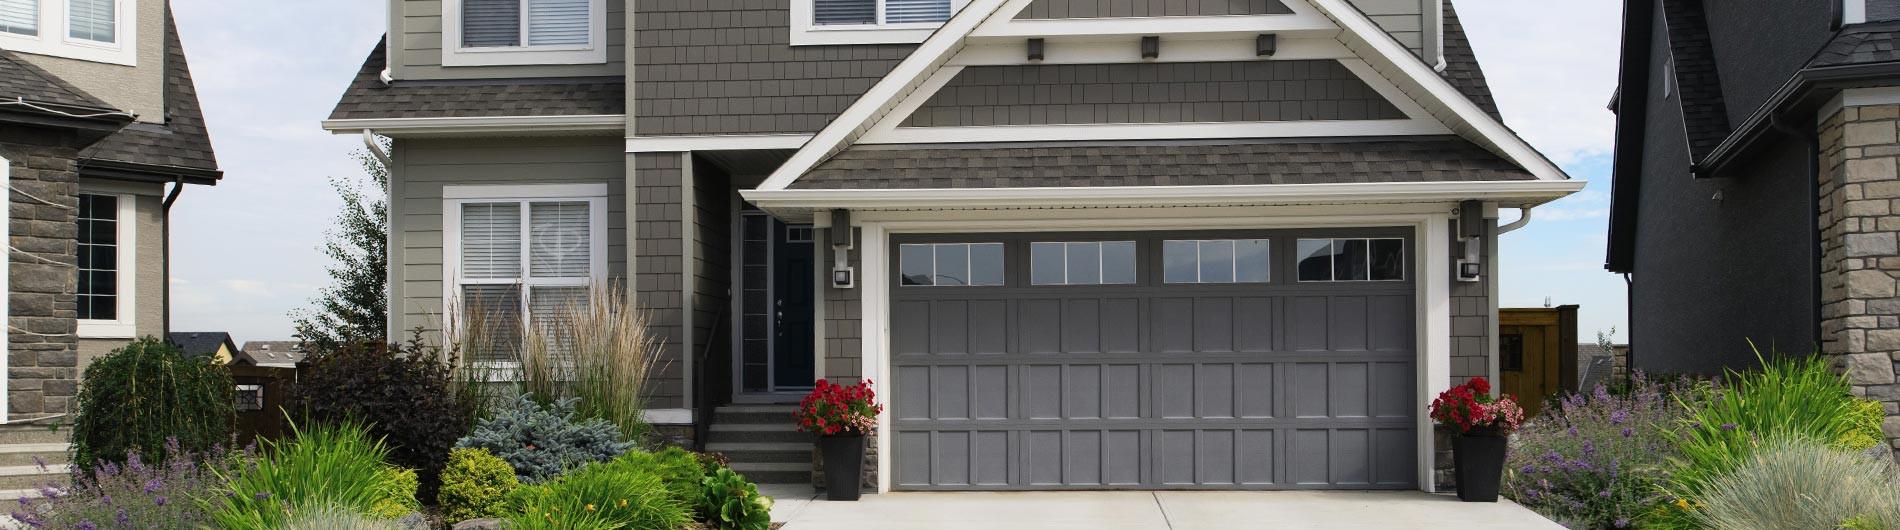 9700-CH-Garage-Door-Providence-Custom-Pa